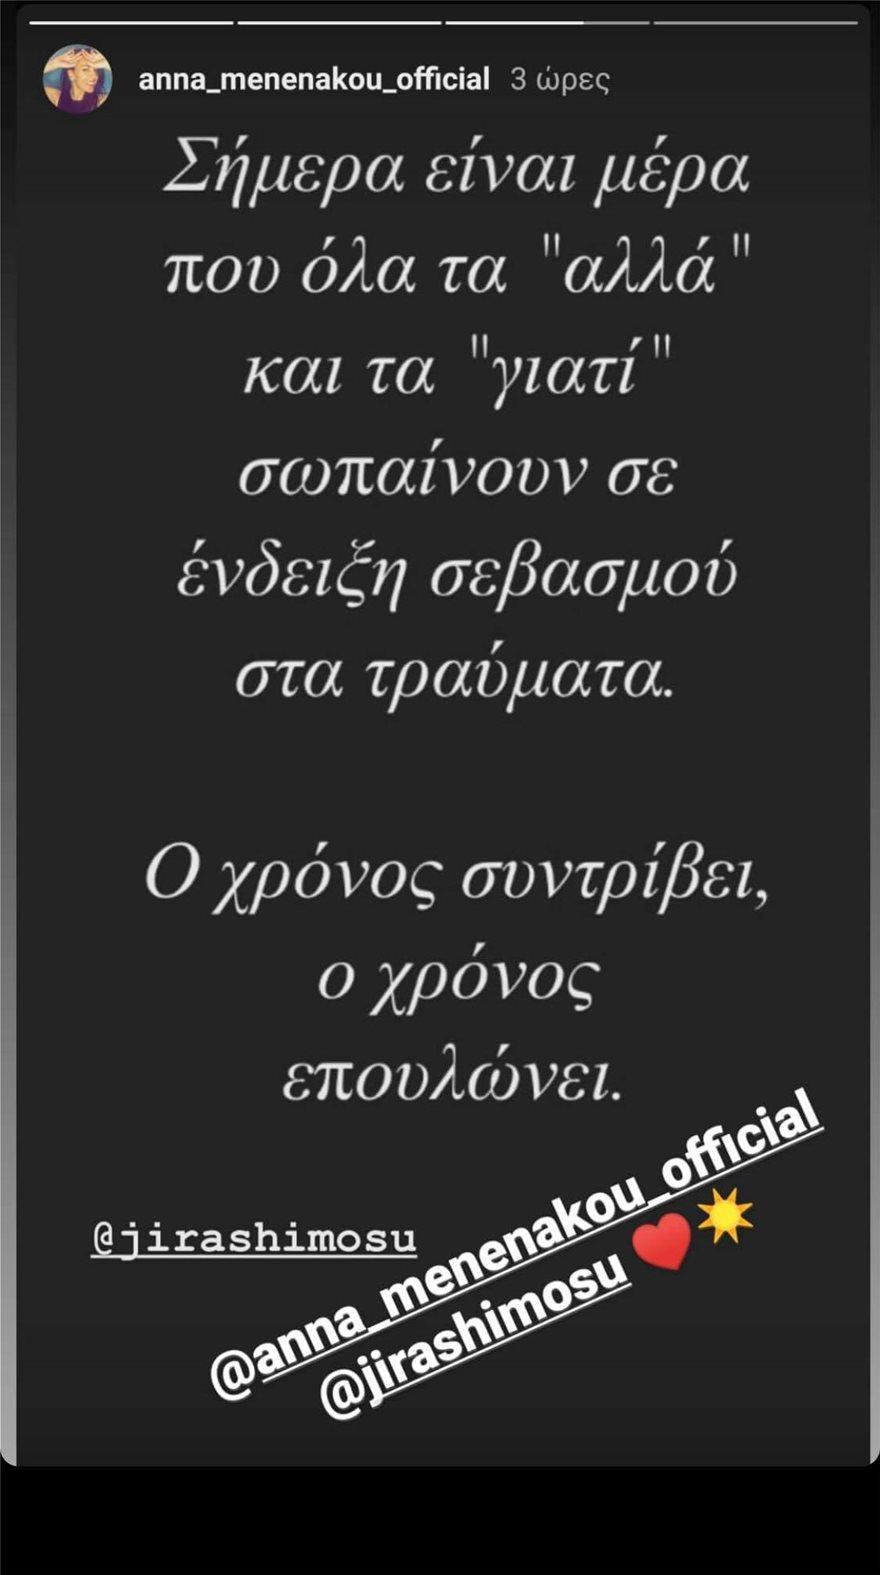 anna_menelakou